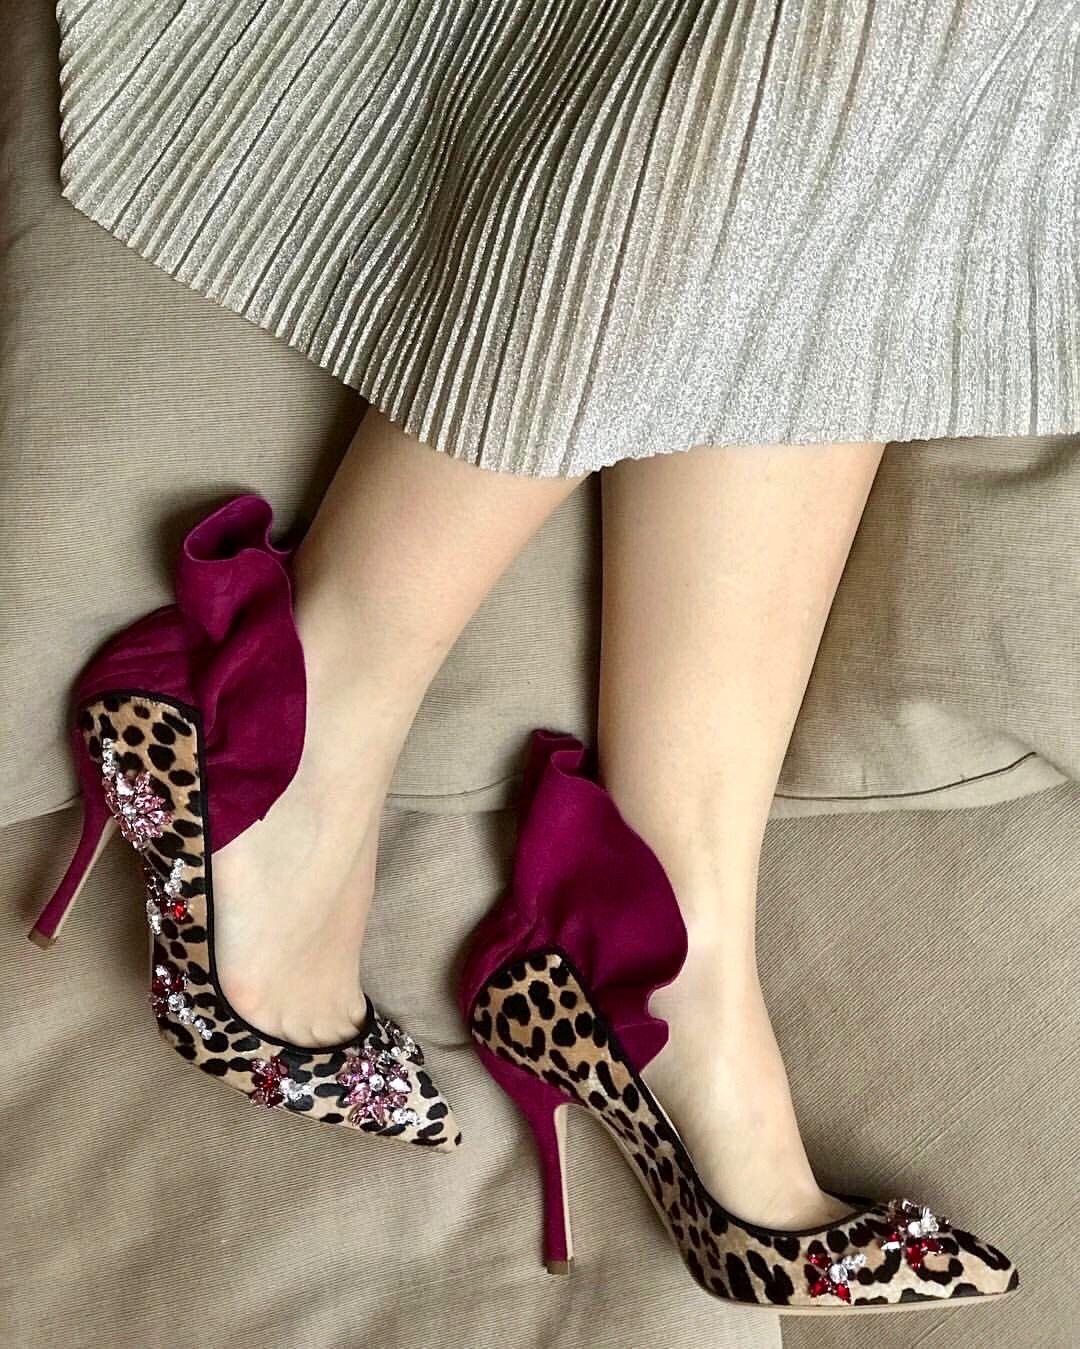 Dahlia Selva Shoes, Boots, Mule shoe